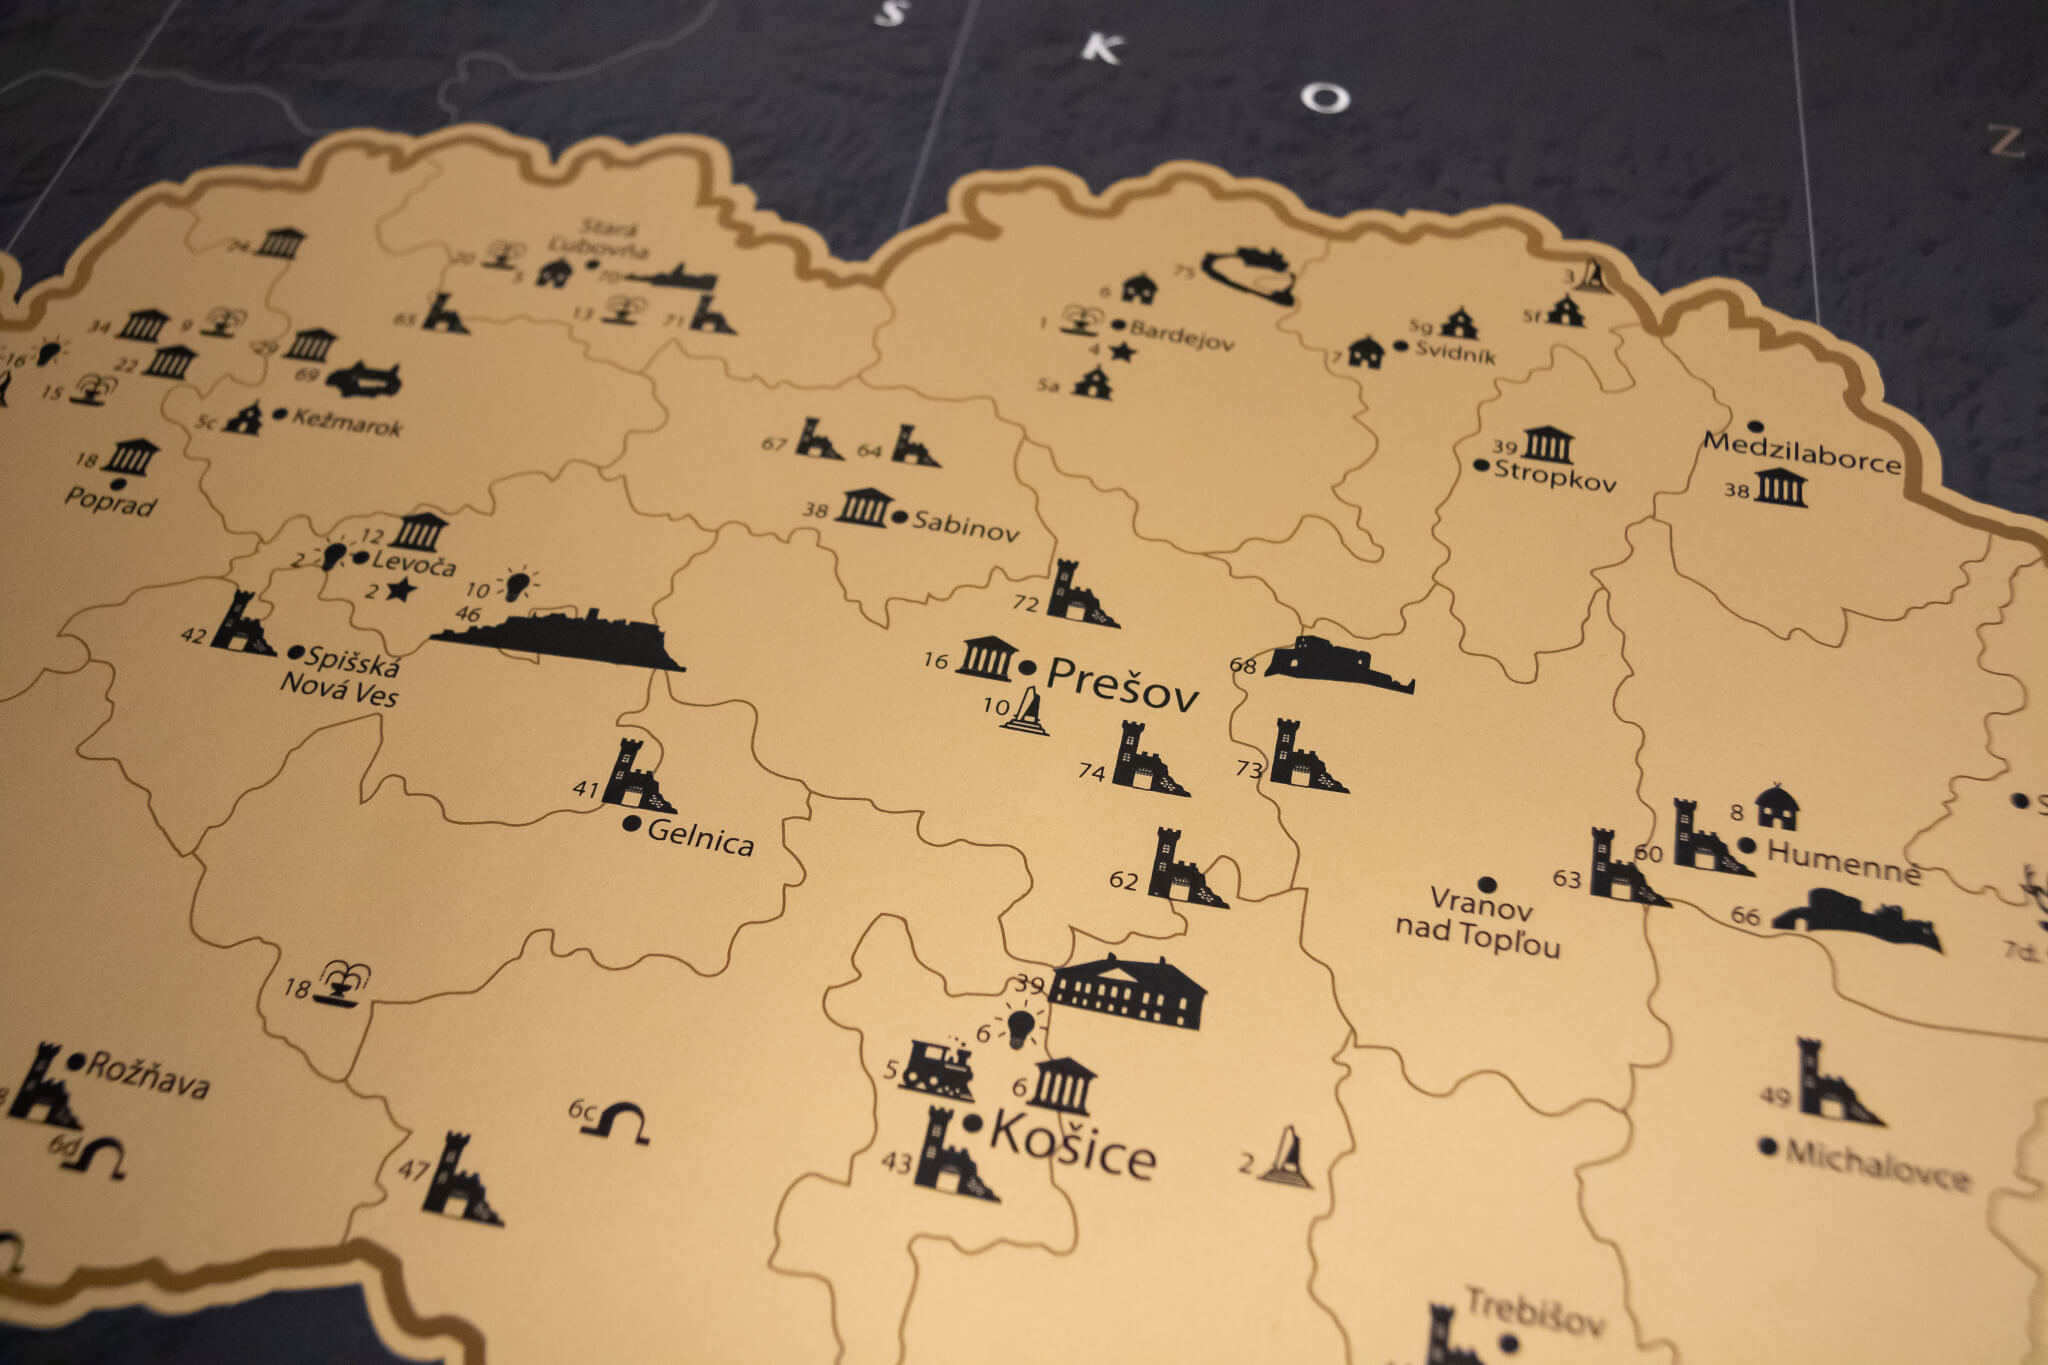 Rubbelkarte Slowakei - Gesamtansicht